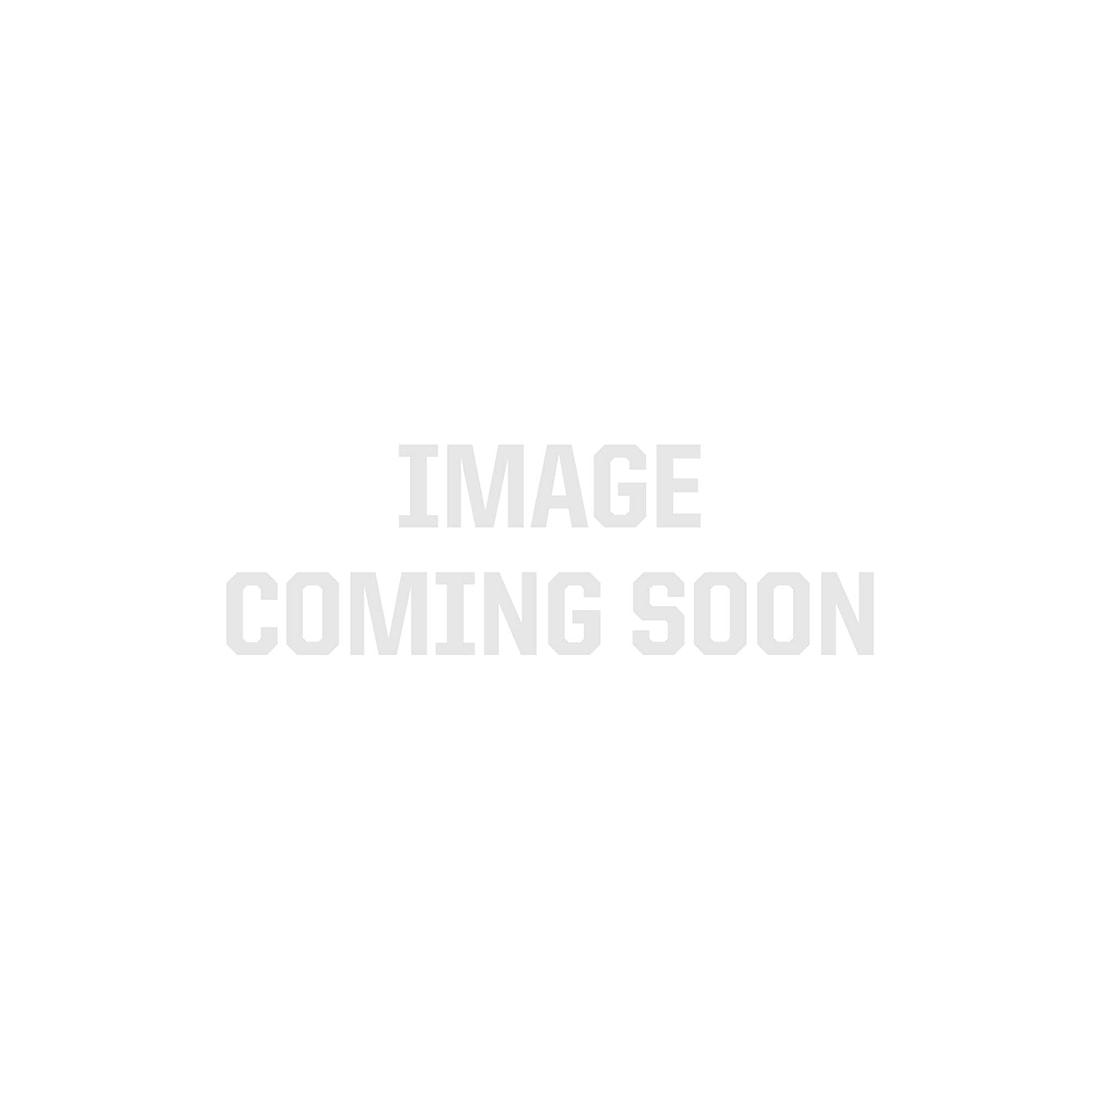 Soft White 2216 TruColor LED Strip Light, 240/m, 10mm wide, Sample Kit